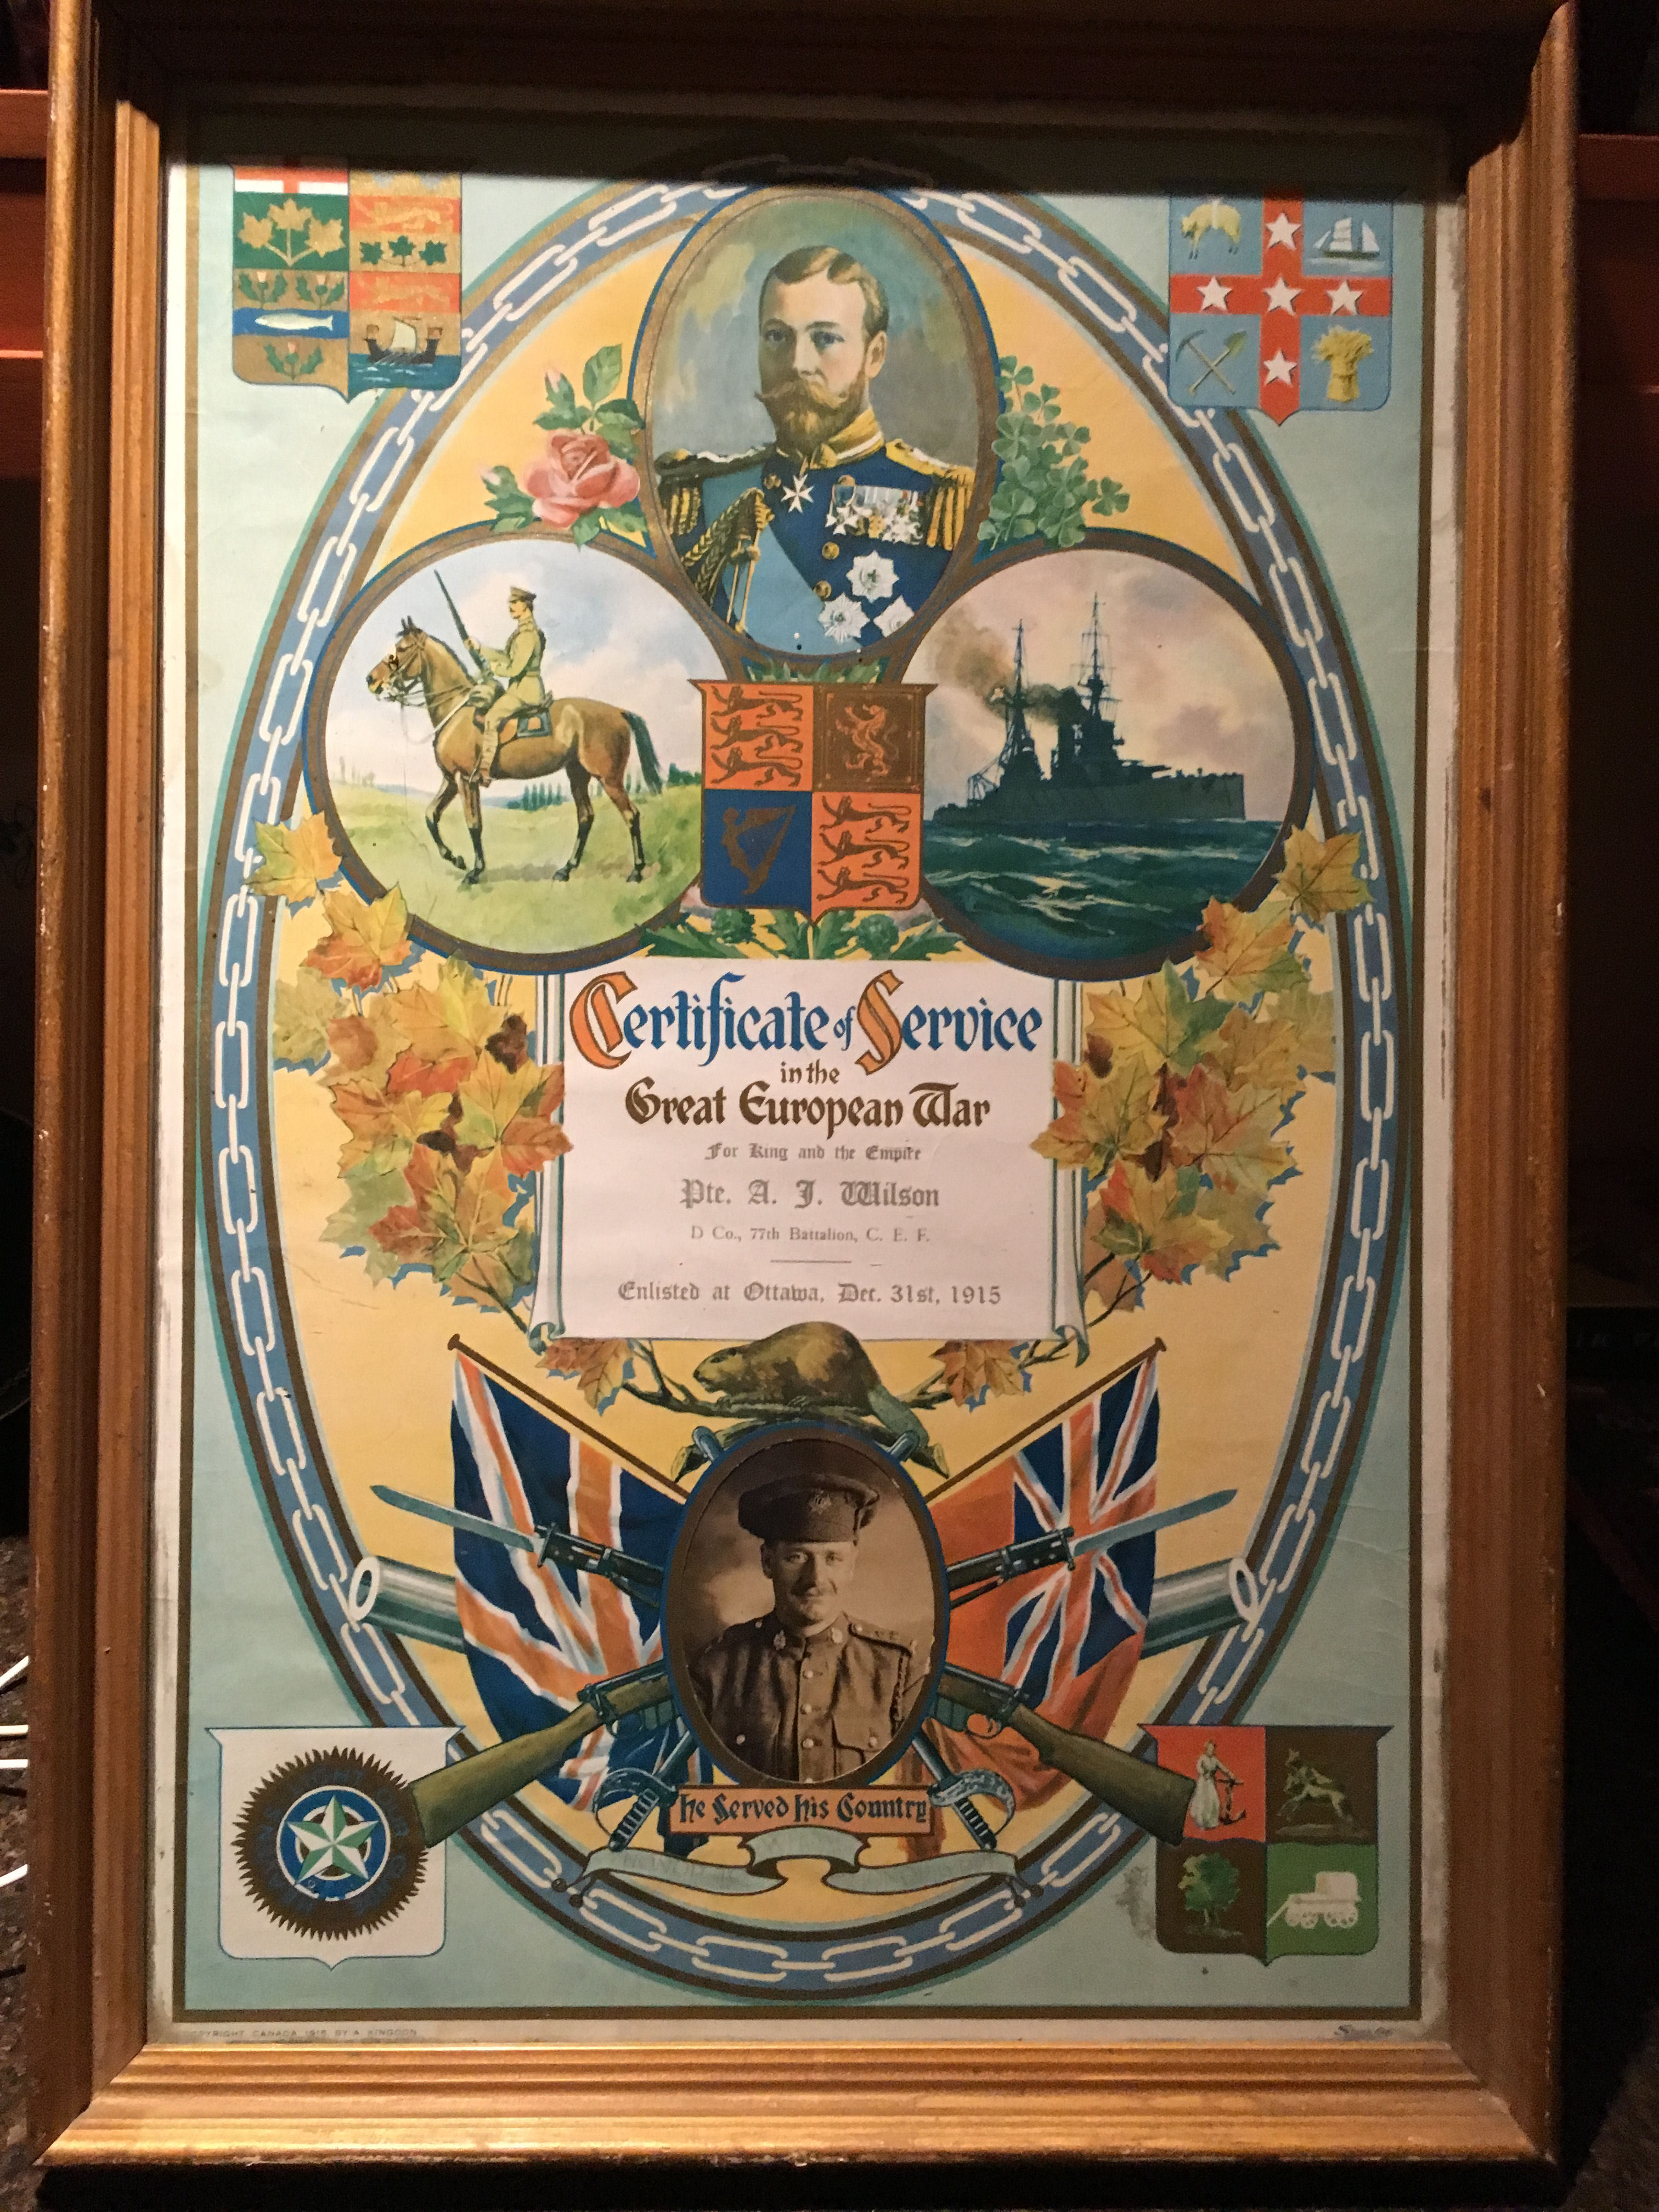 Certificate of Service for Private Albert J Wilson